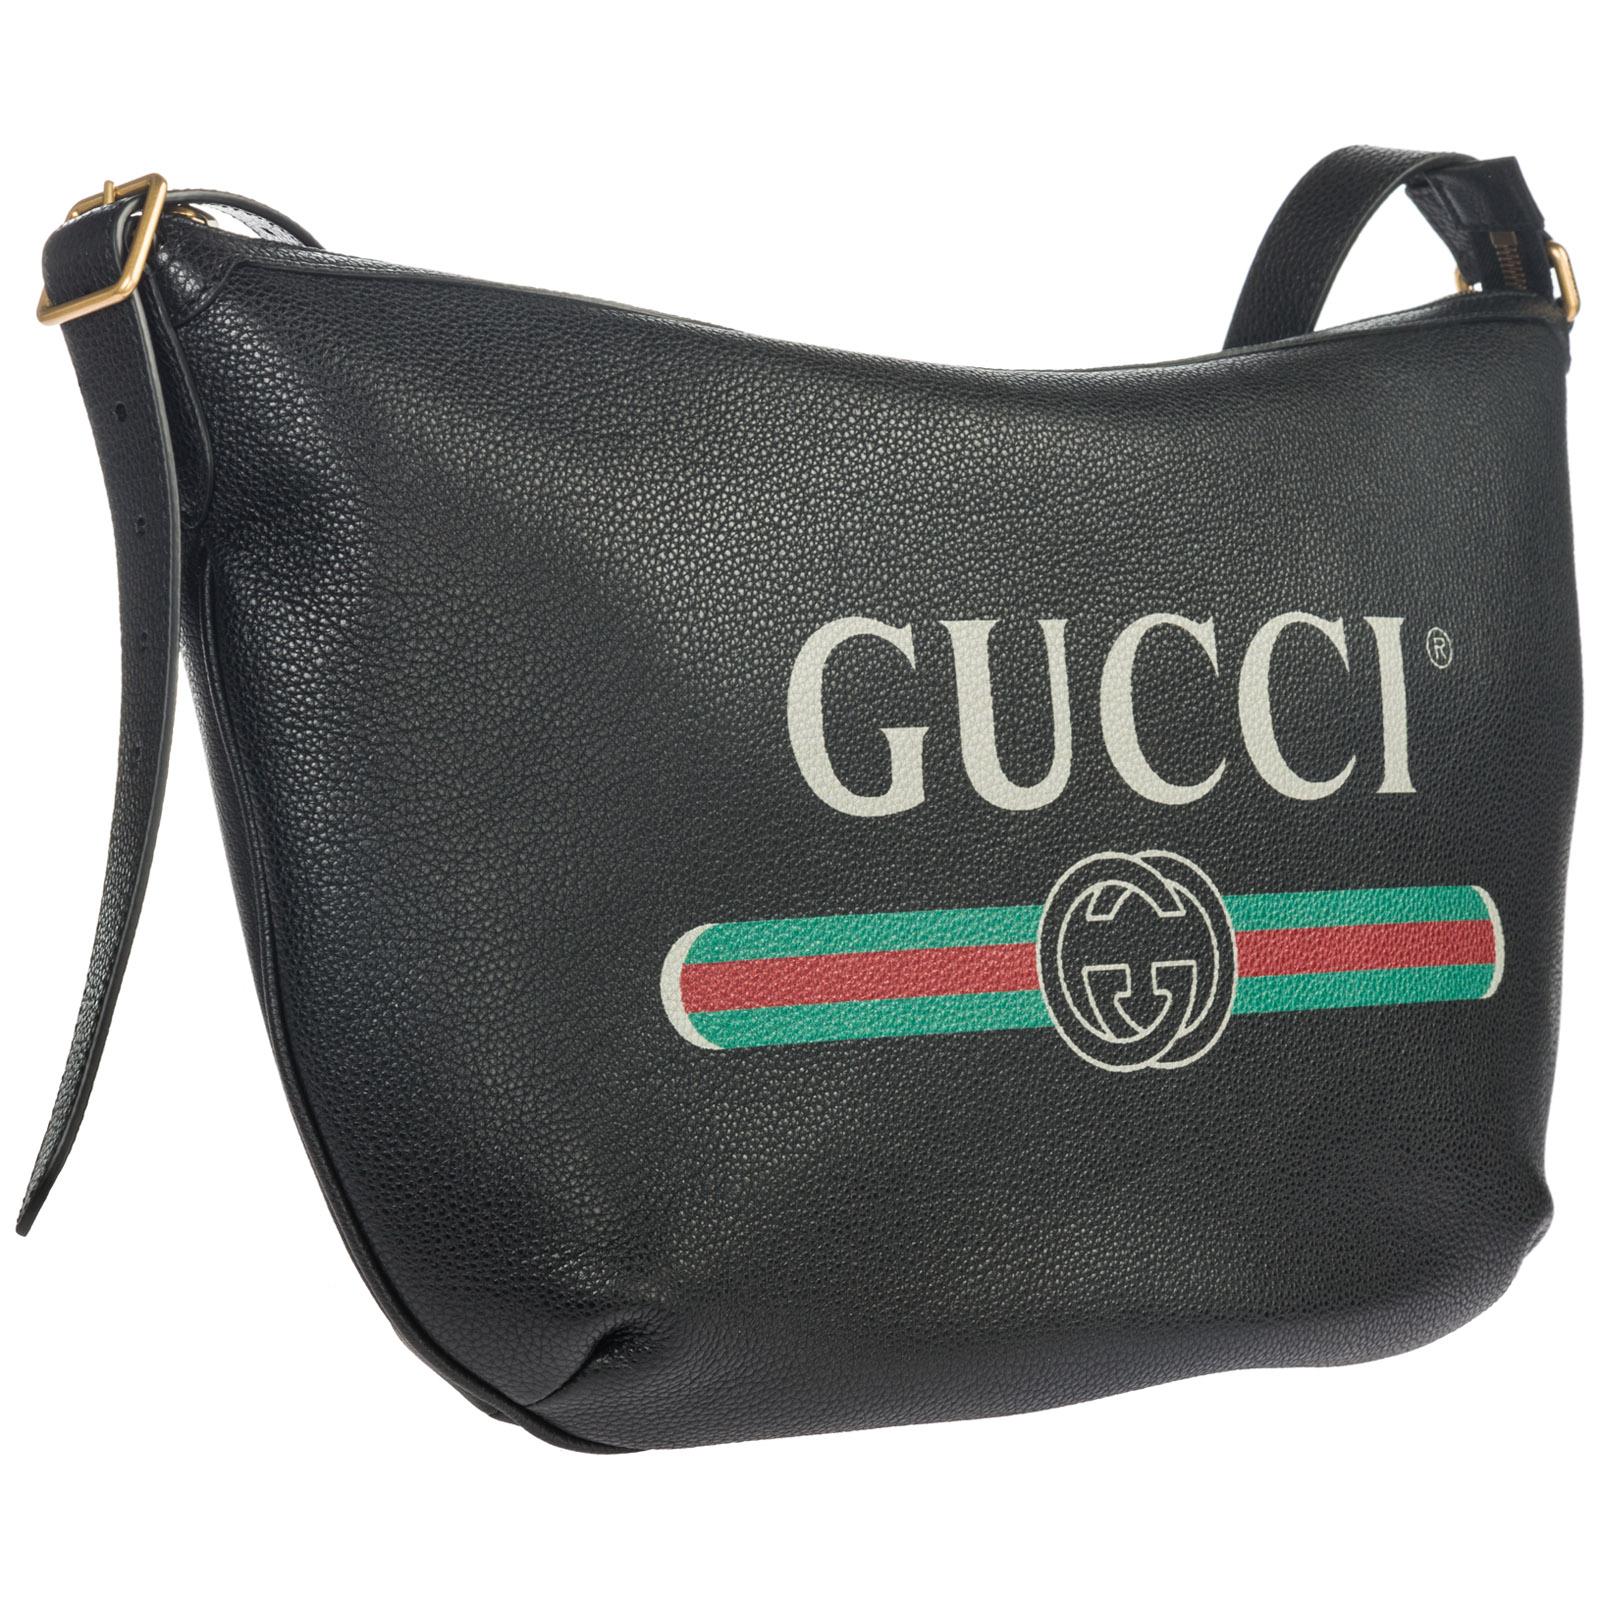 2bdda93cd80 ... Women s leather cross-body messenger shoulder bag gucci print ...